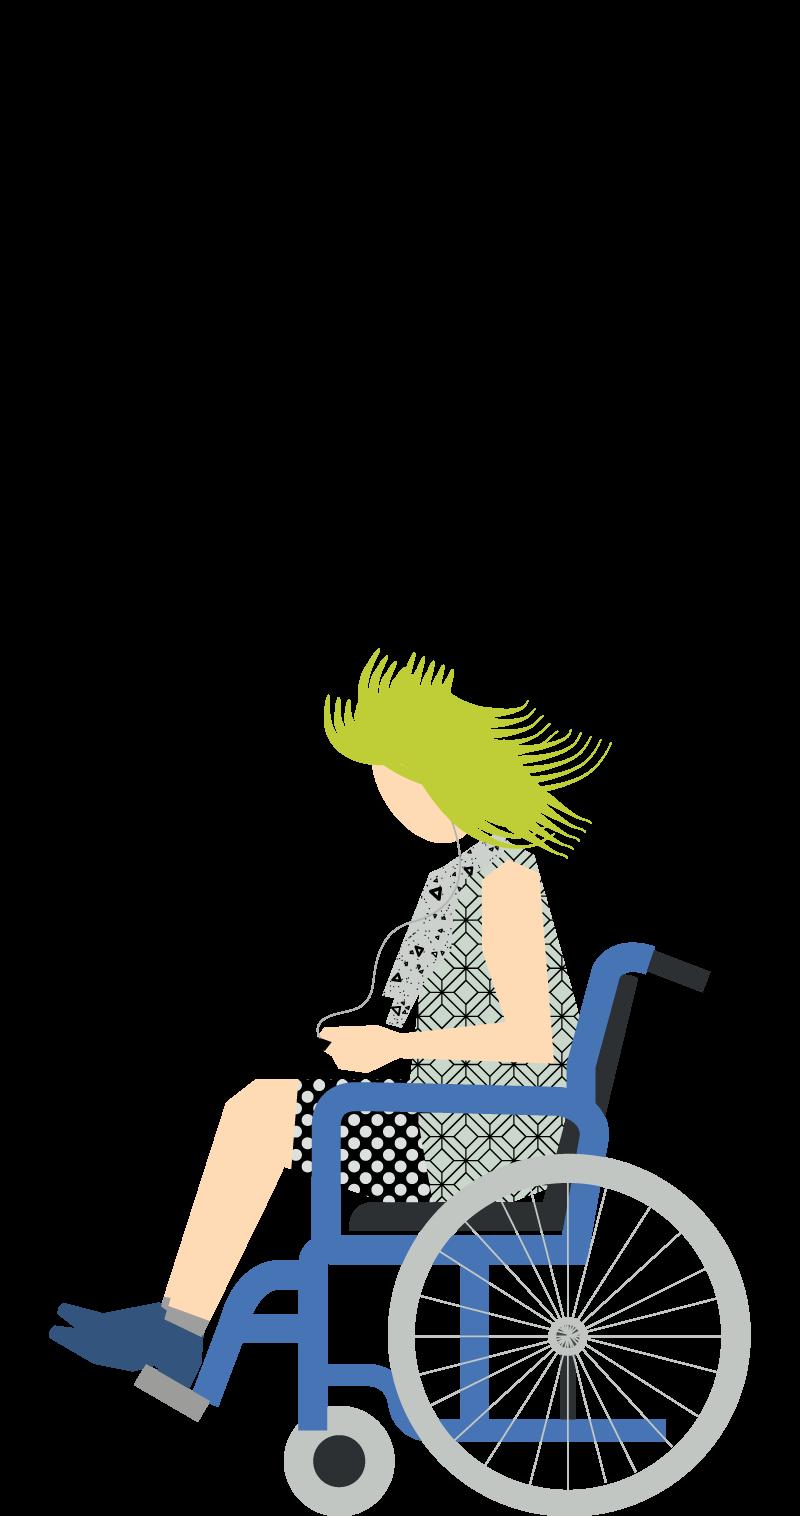 Rachel archifunky cutoutmix by. Humans clipart cutout